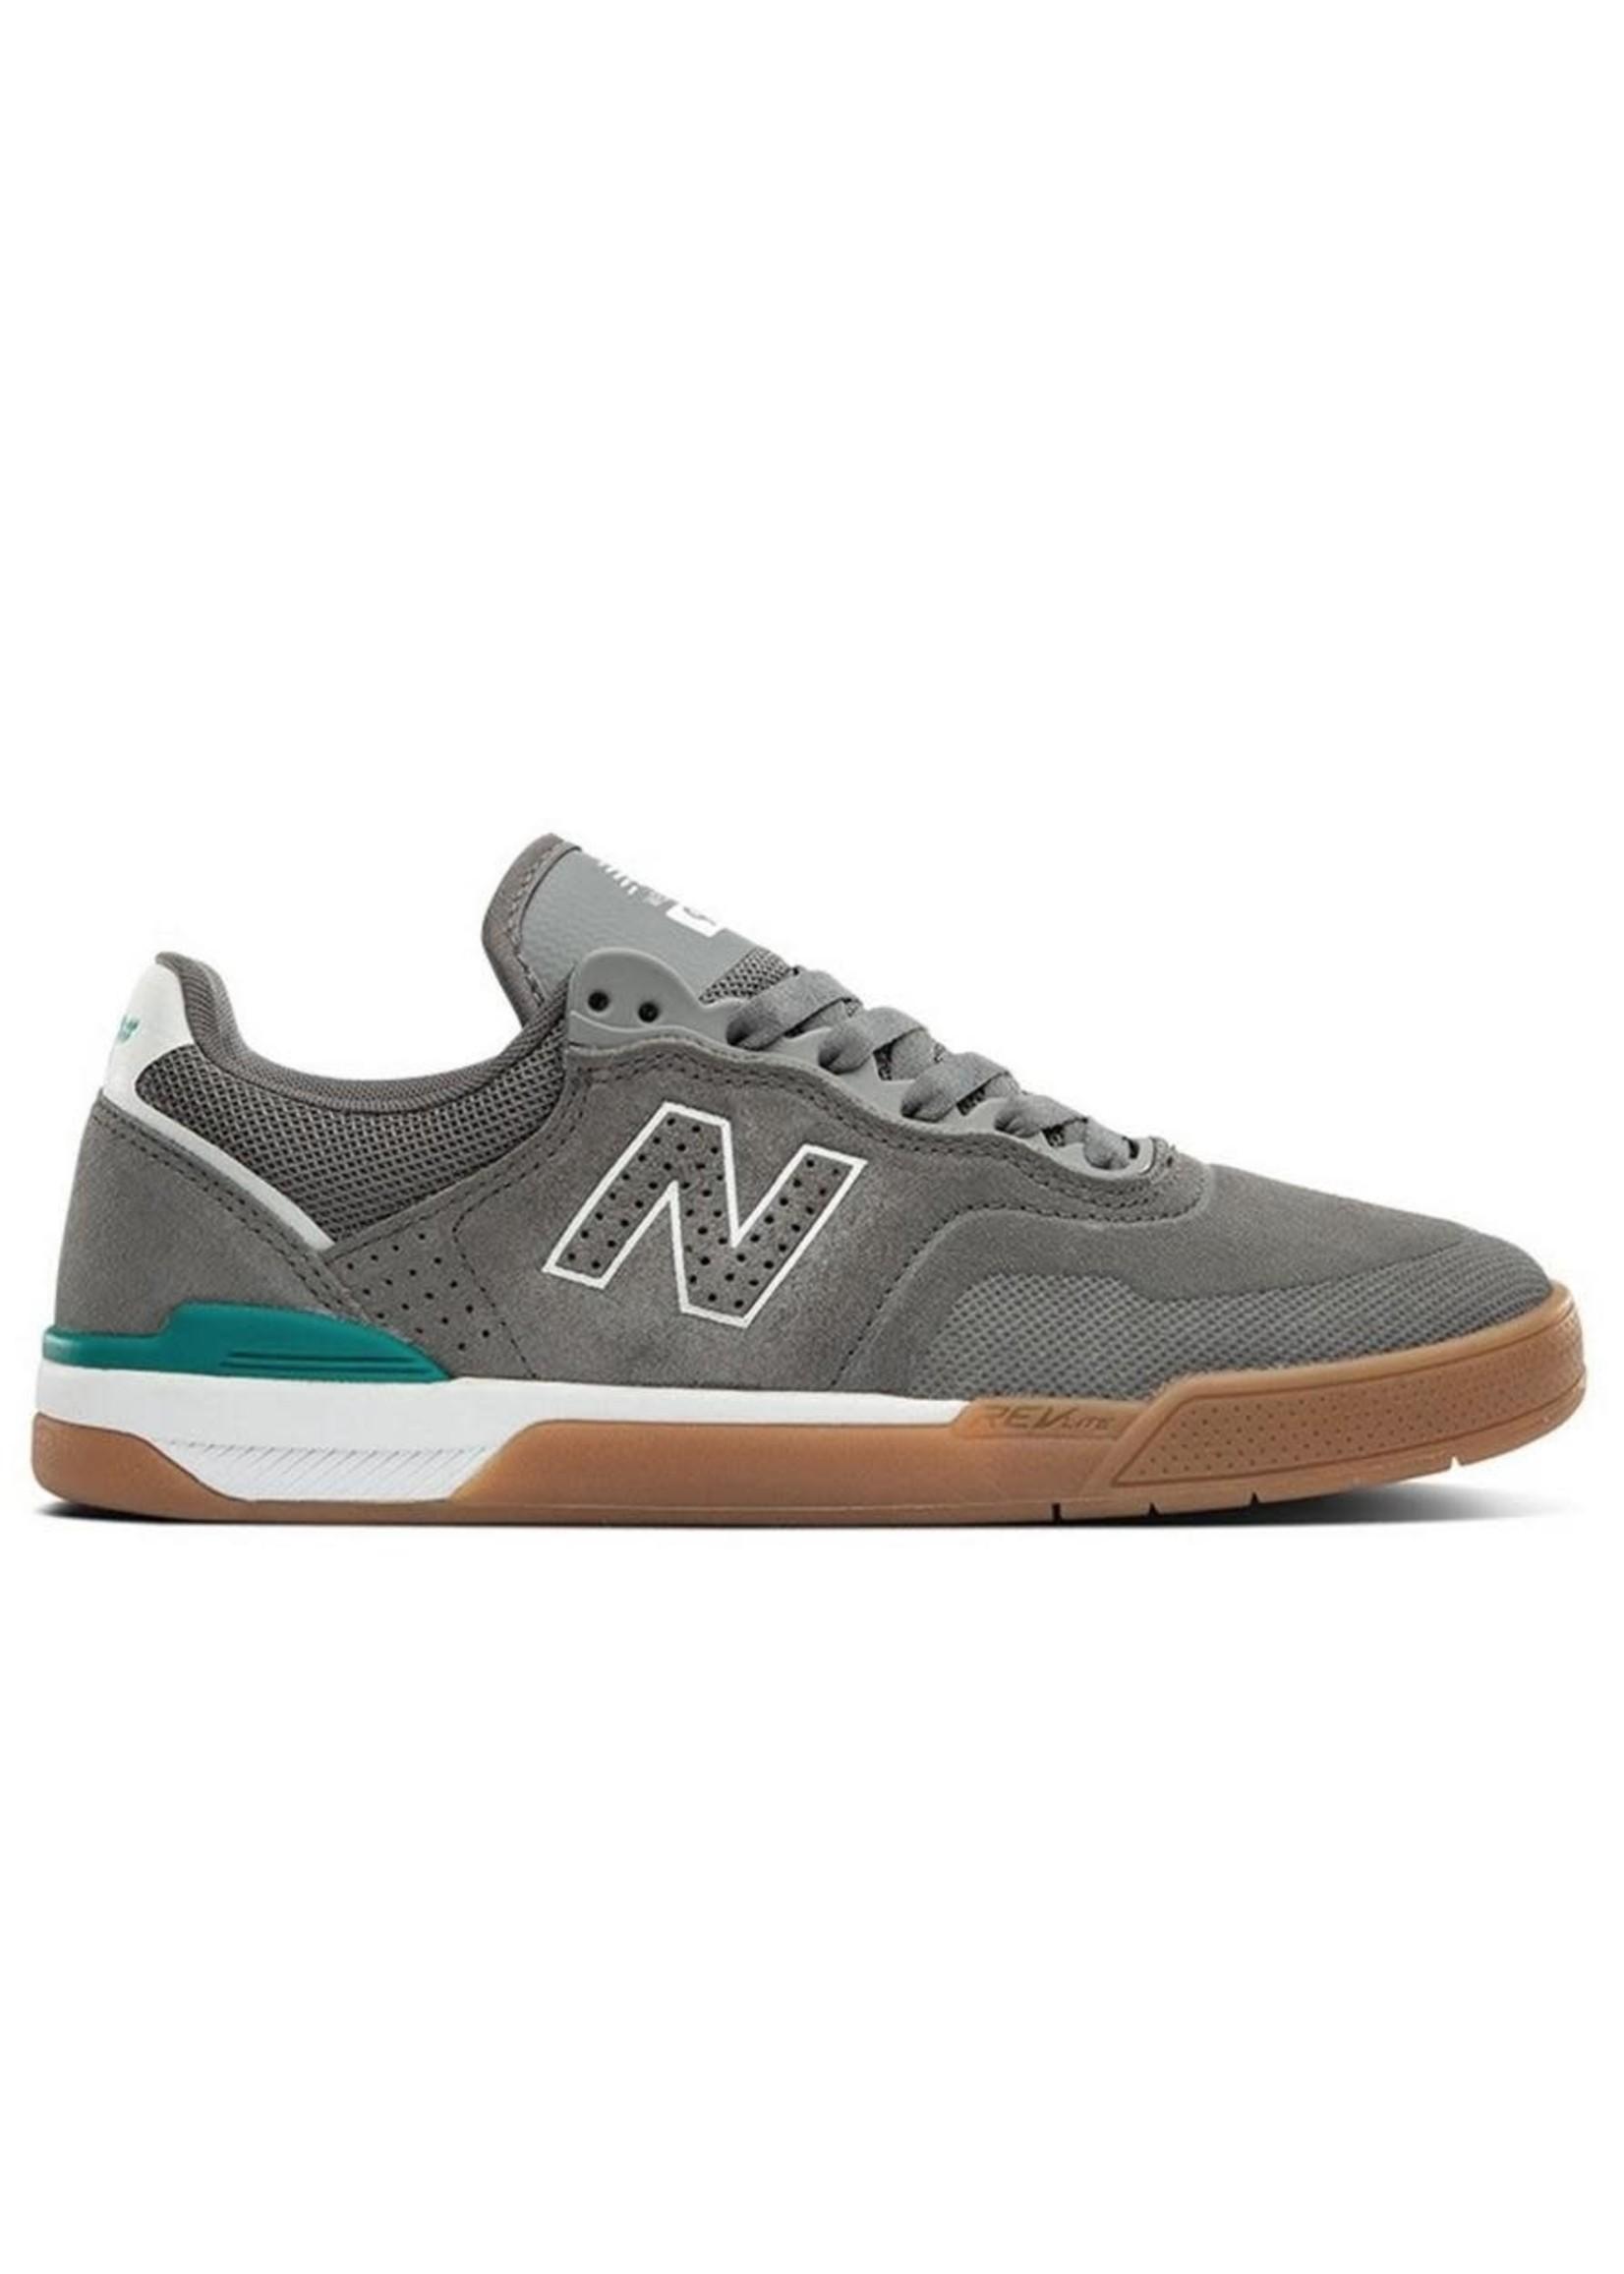 New Balance New Balance Numeric 913